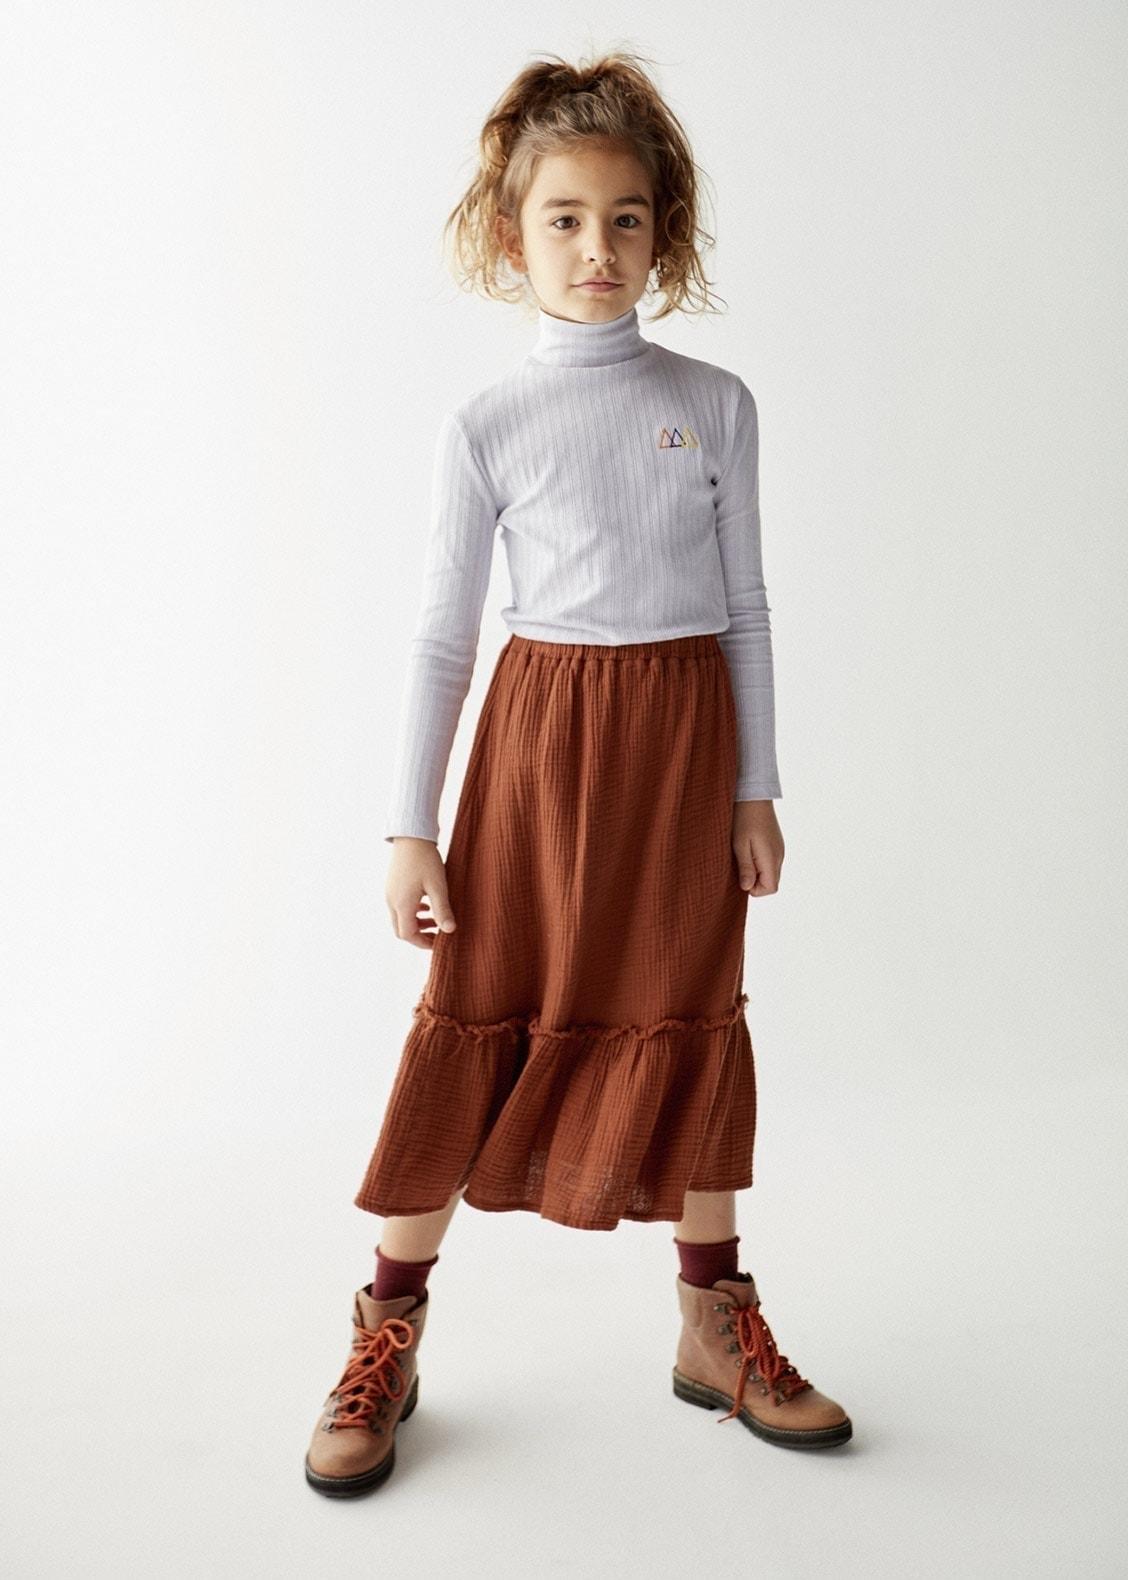 Bambula-skirt-kid